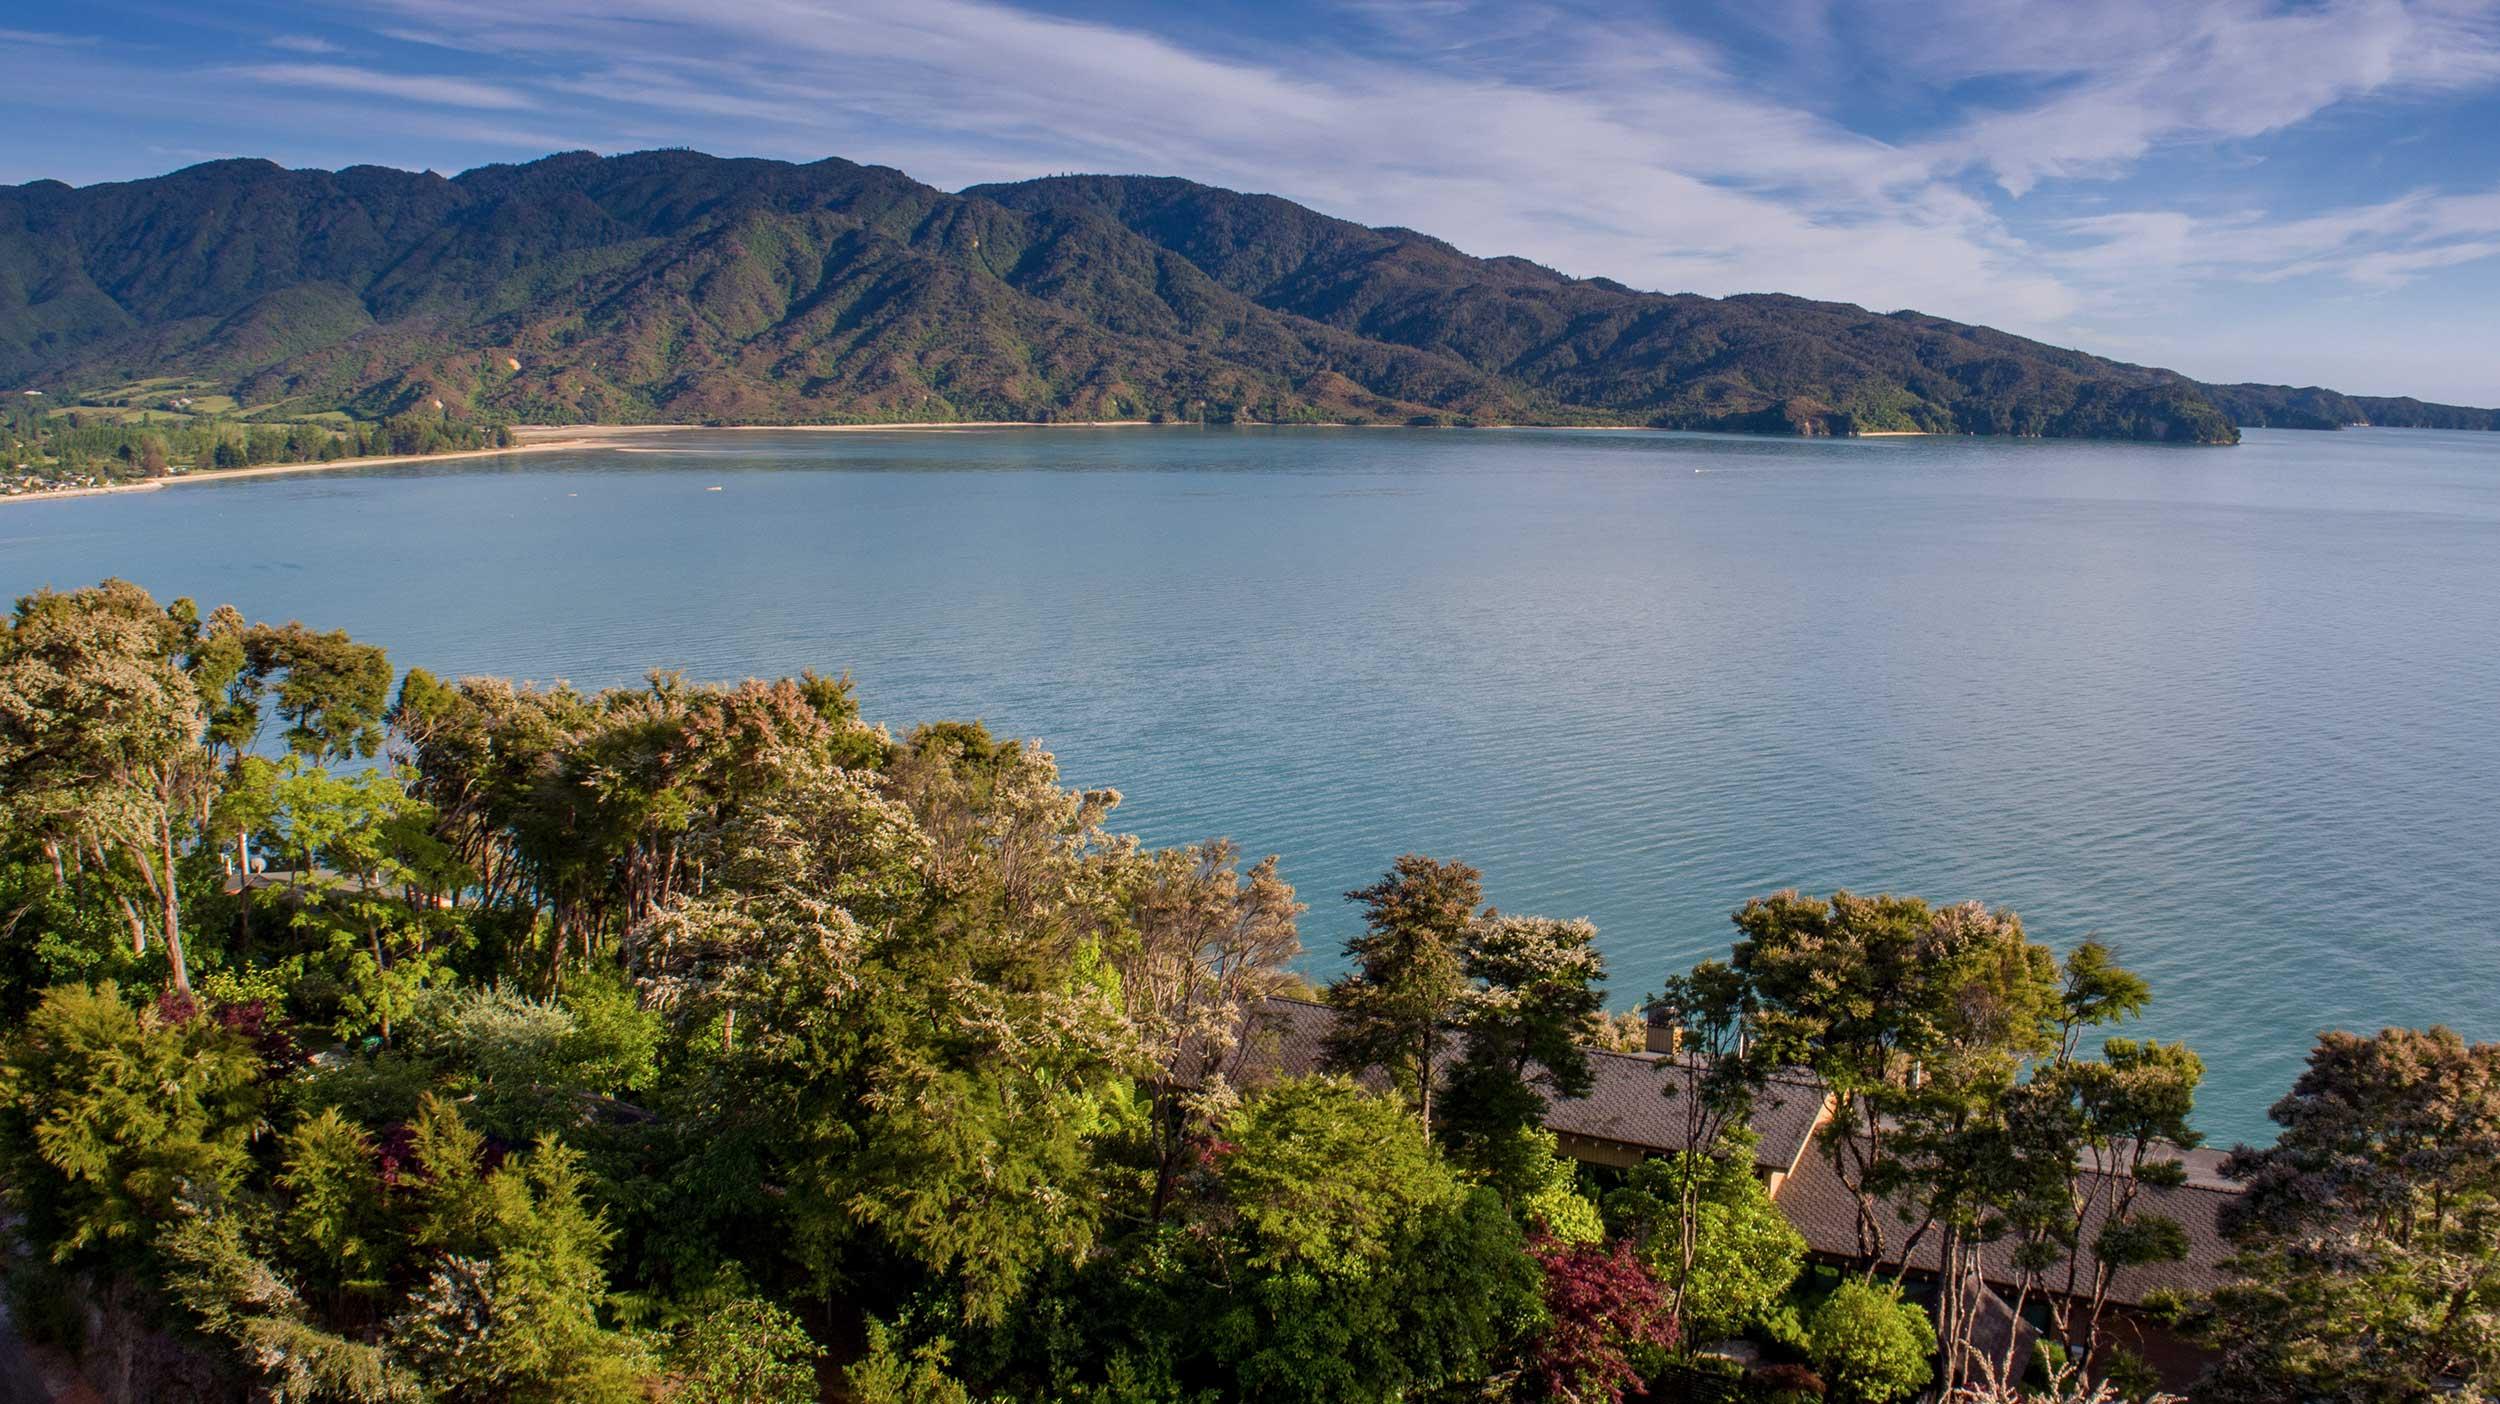 Luxury-Accommodation-New-Zealand-Split-Apple-Retreat-Healthy-From-Above.jpg